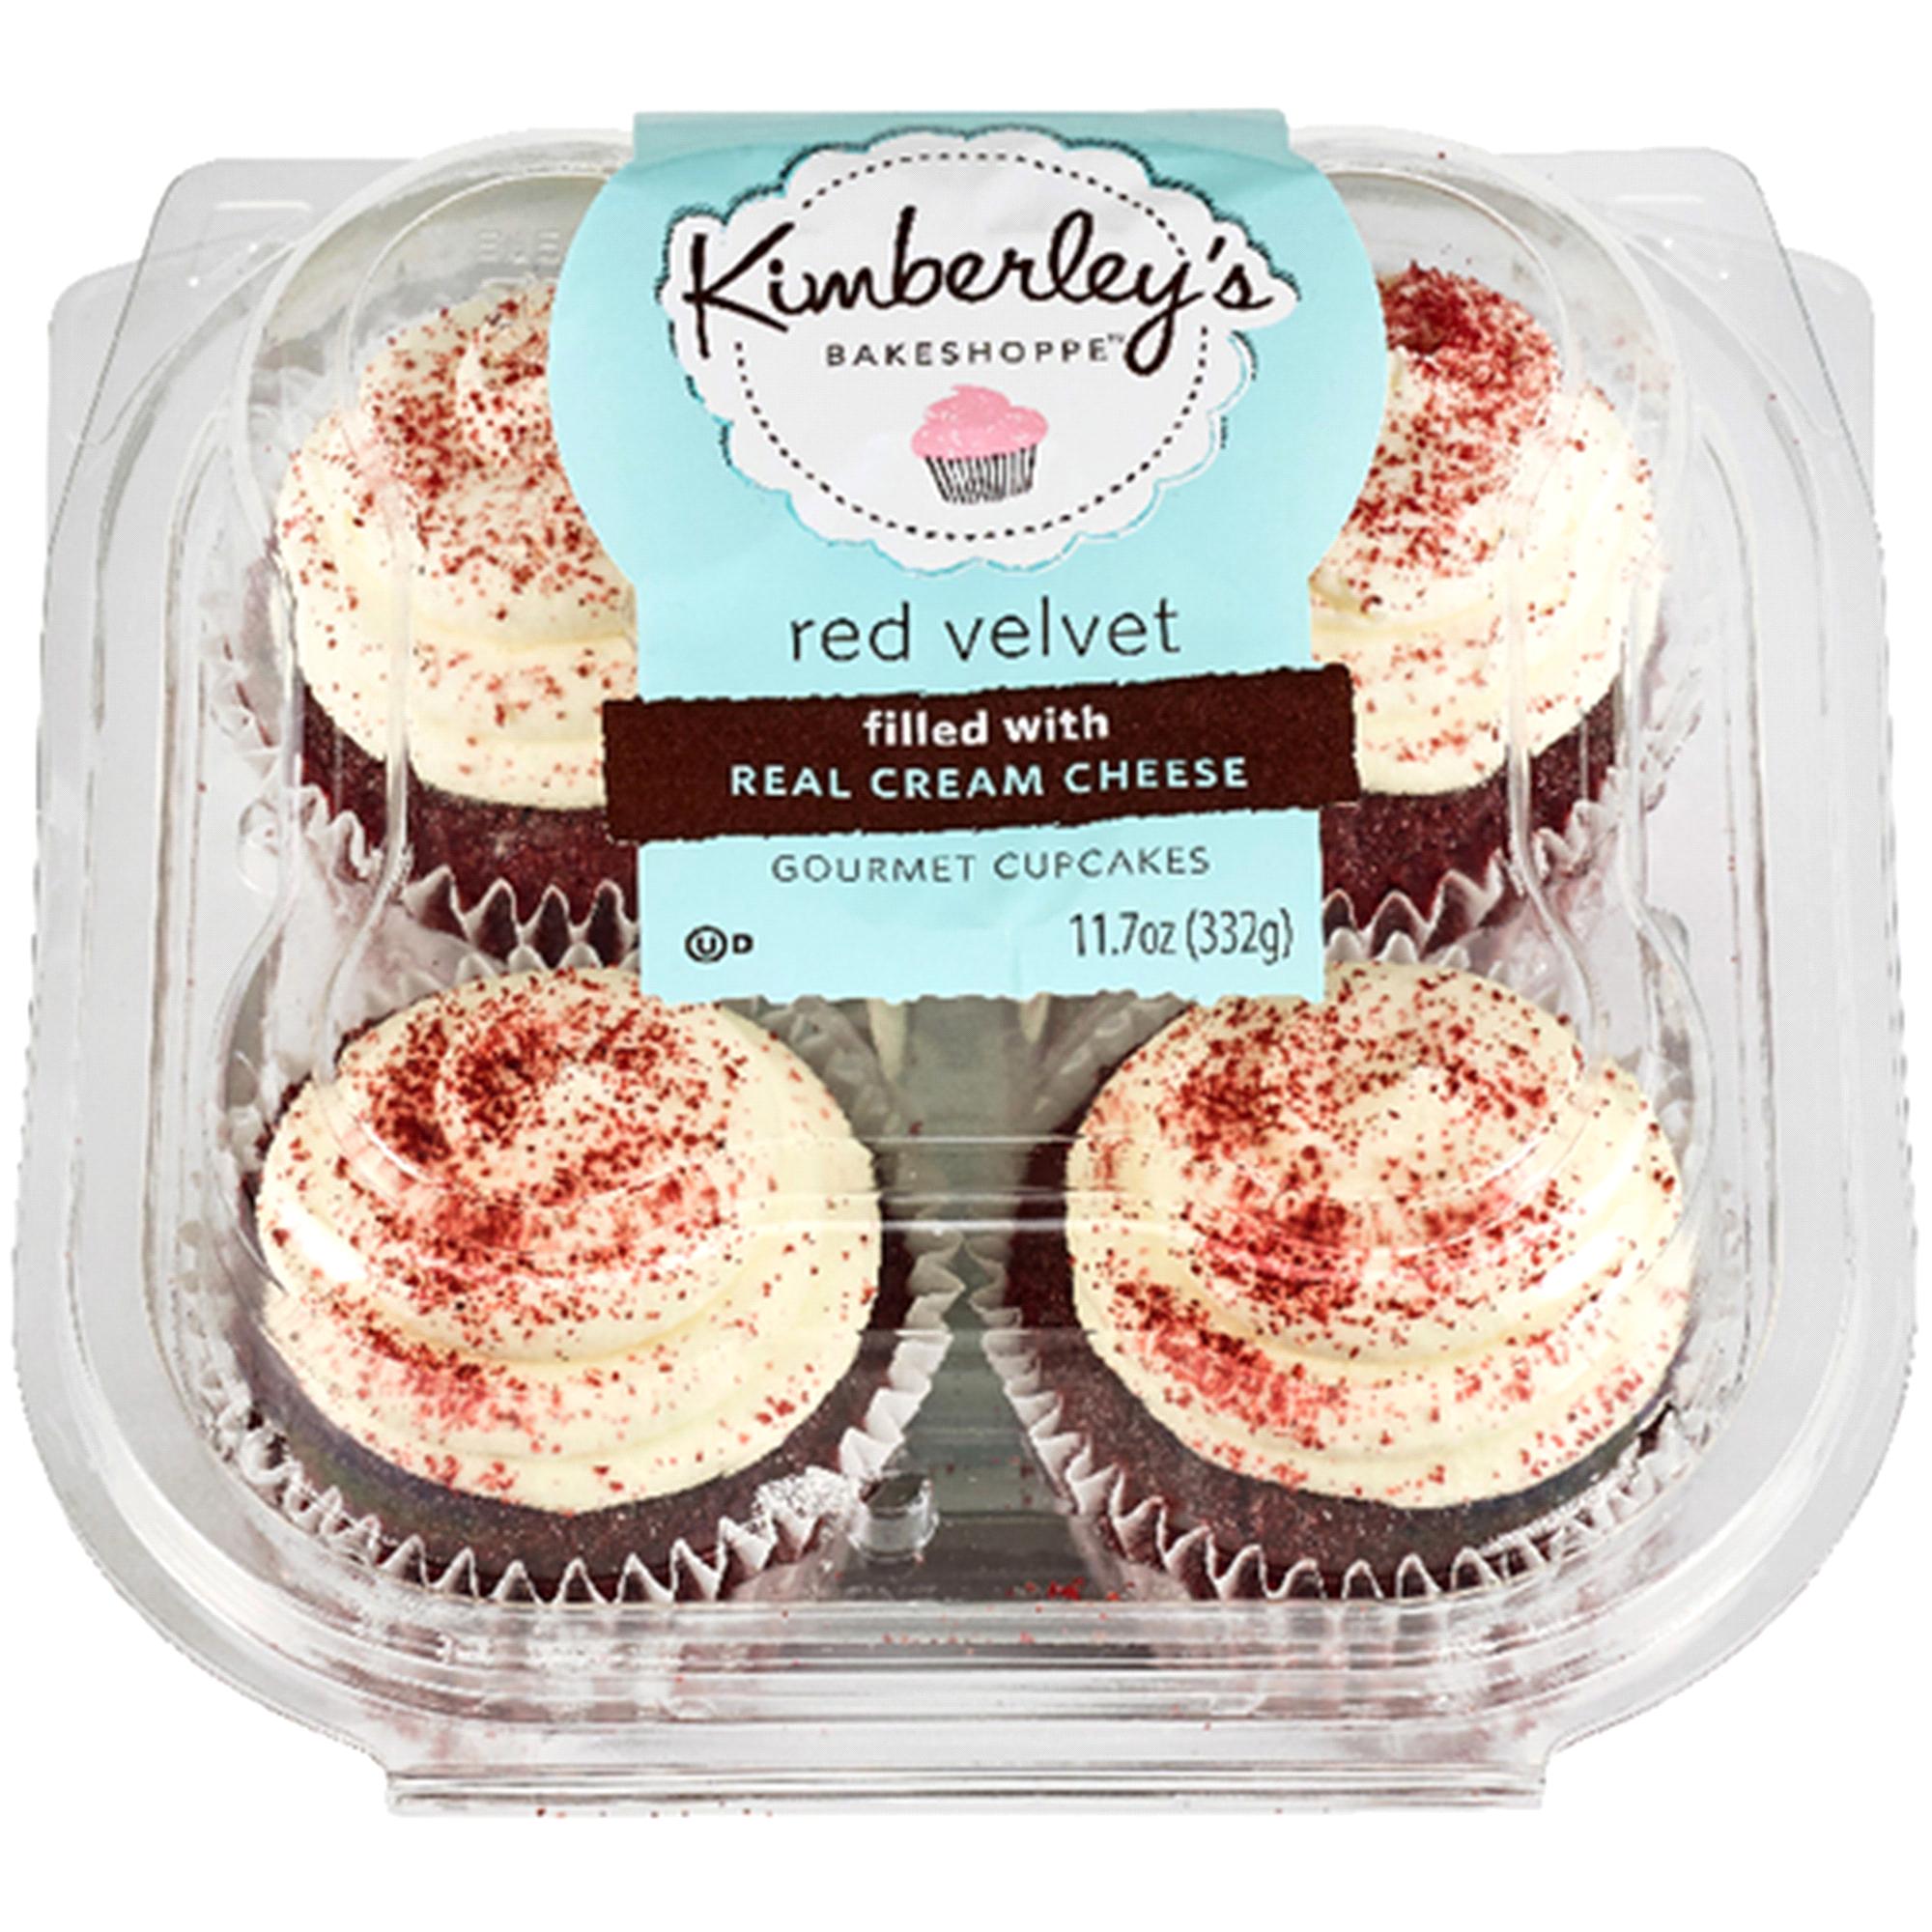 Kimberlys Cupcakes Red Velvet 4 ct 11 7 oz